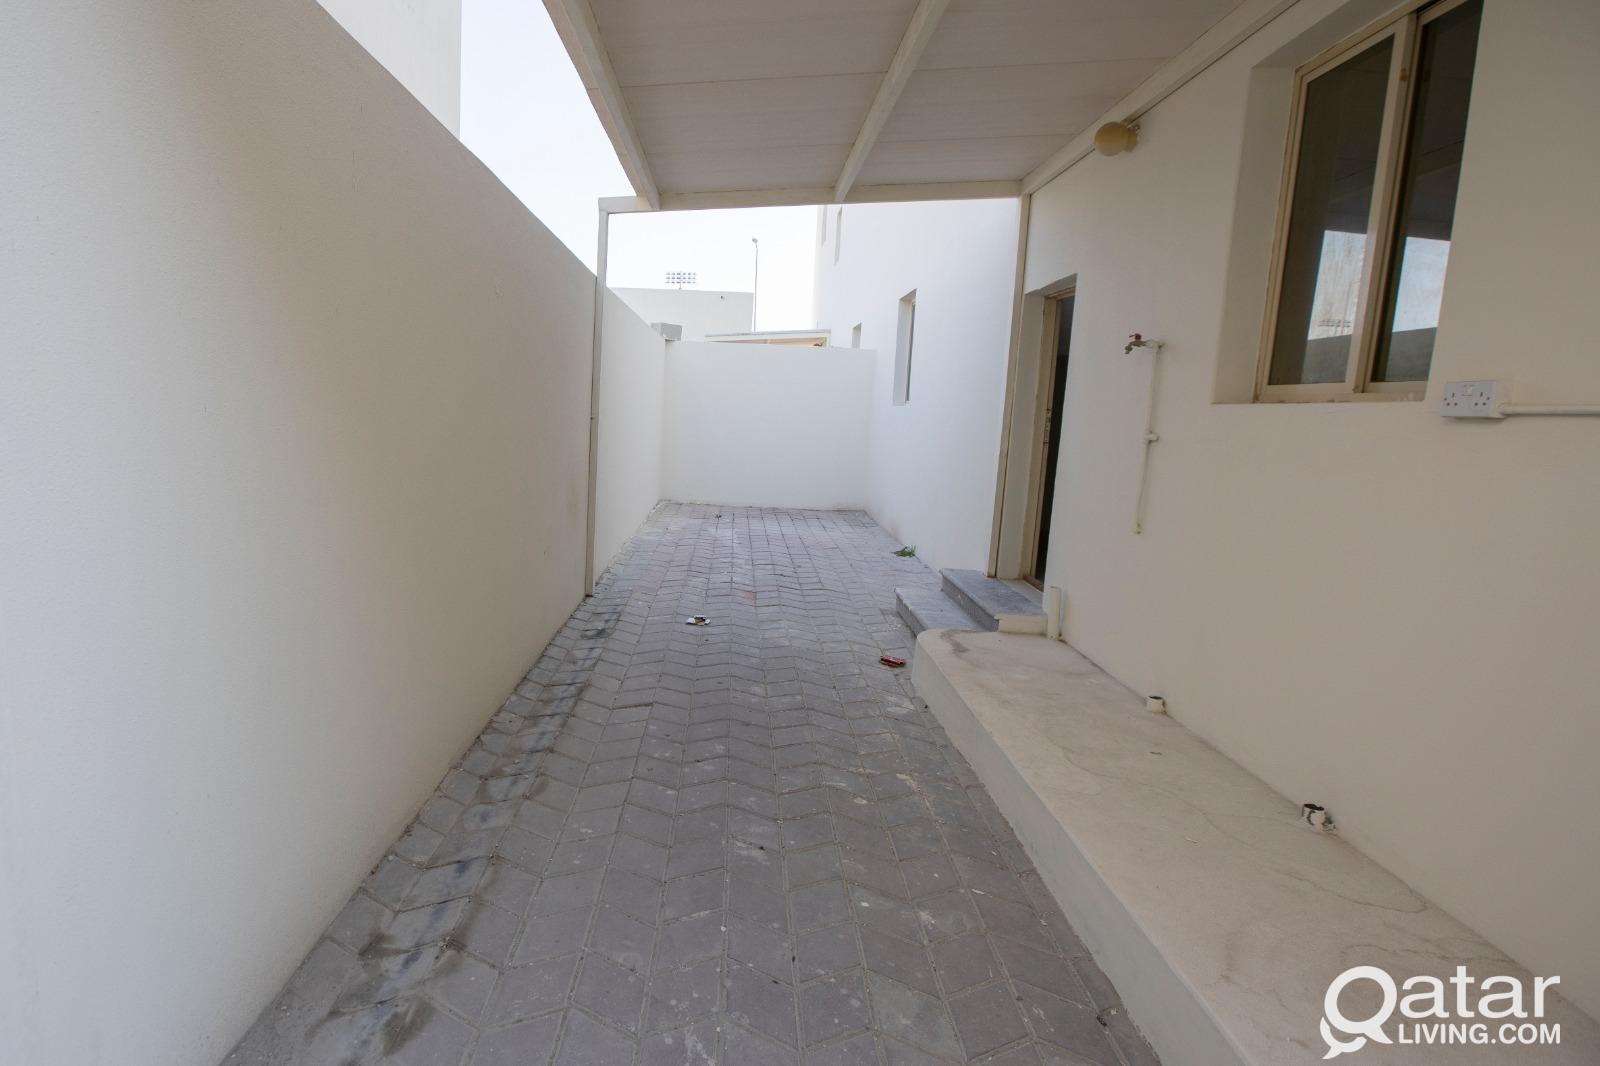 6BR Compound Villa in Muaither ( OS 1047 )